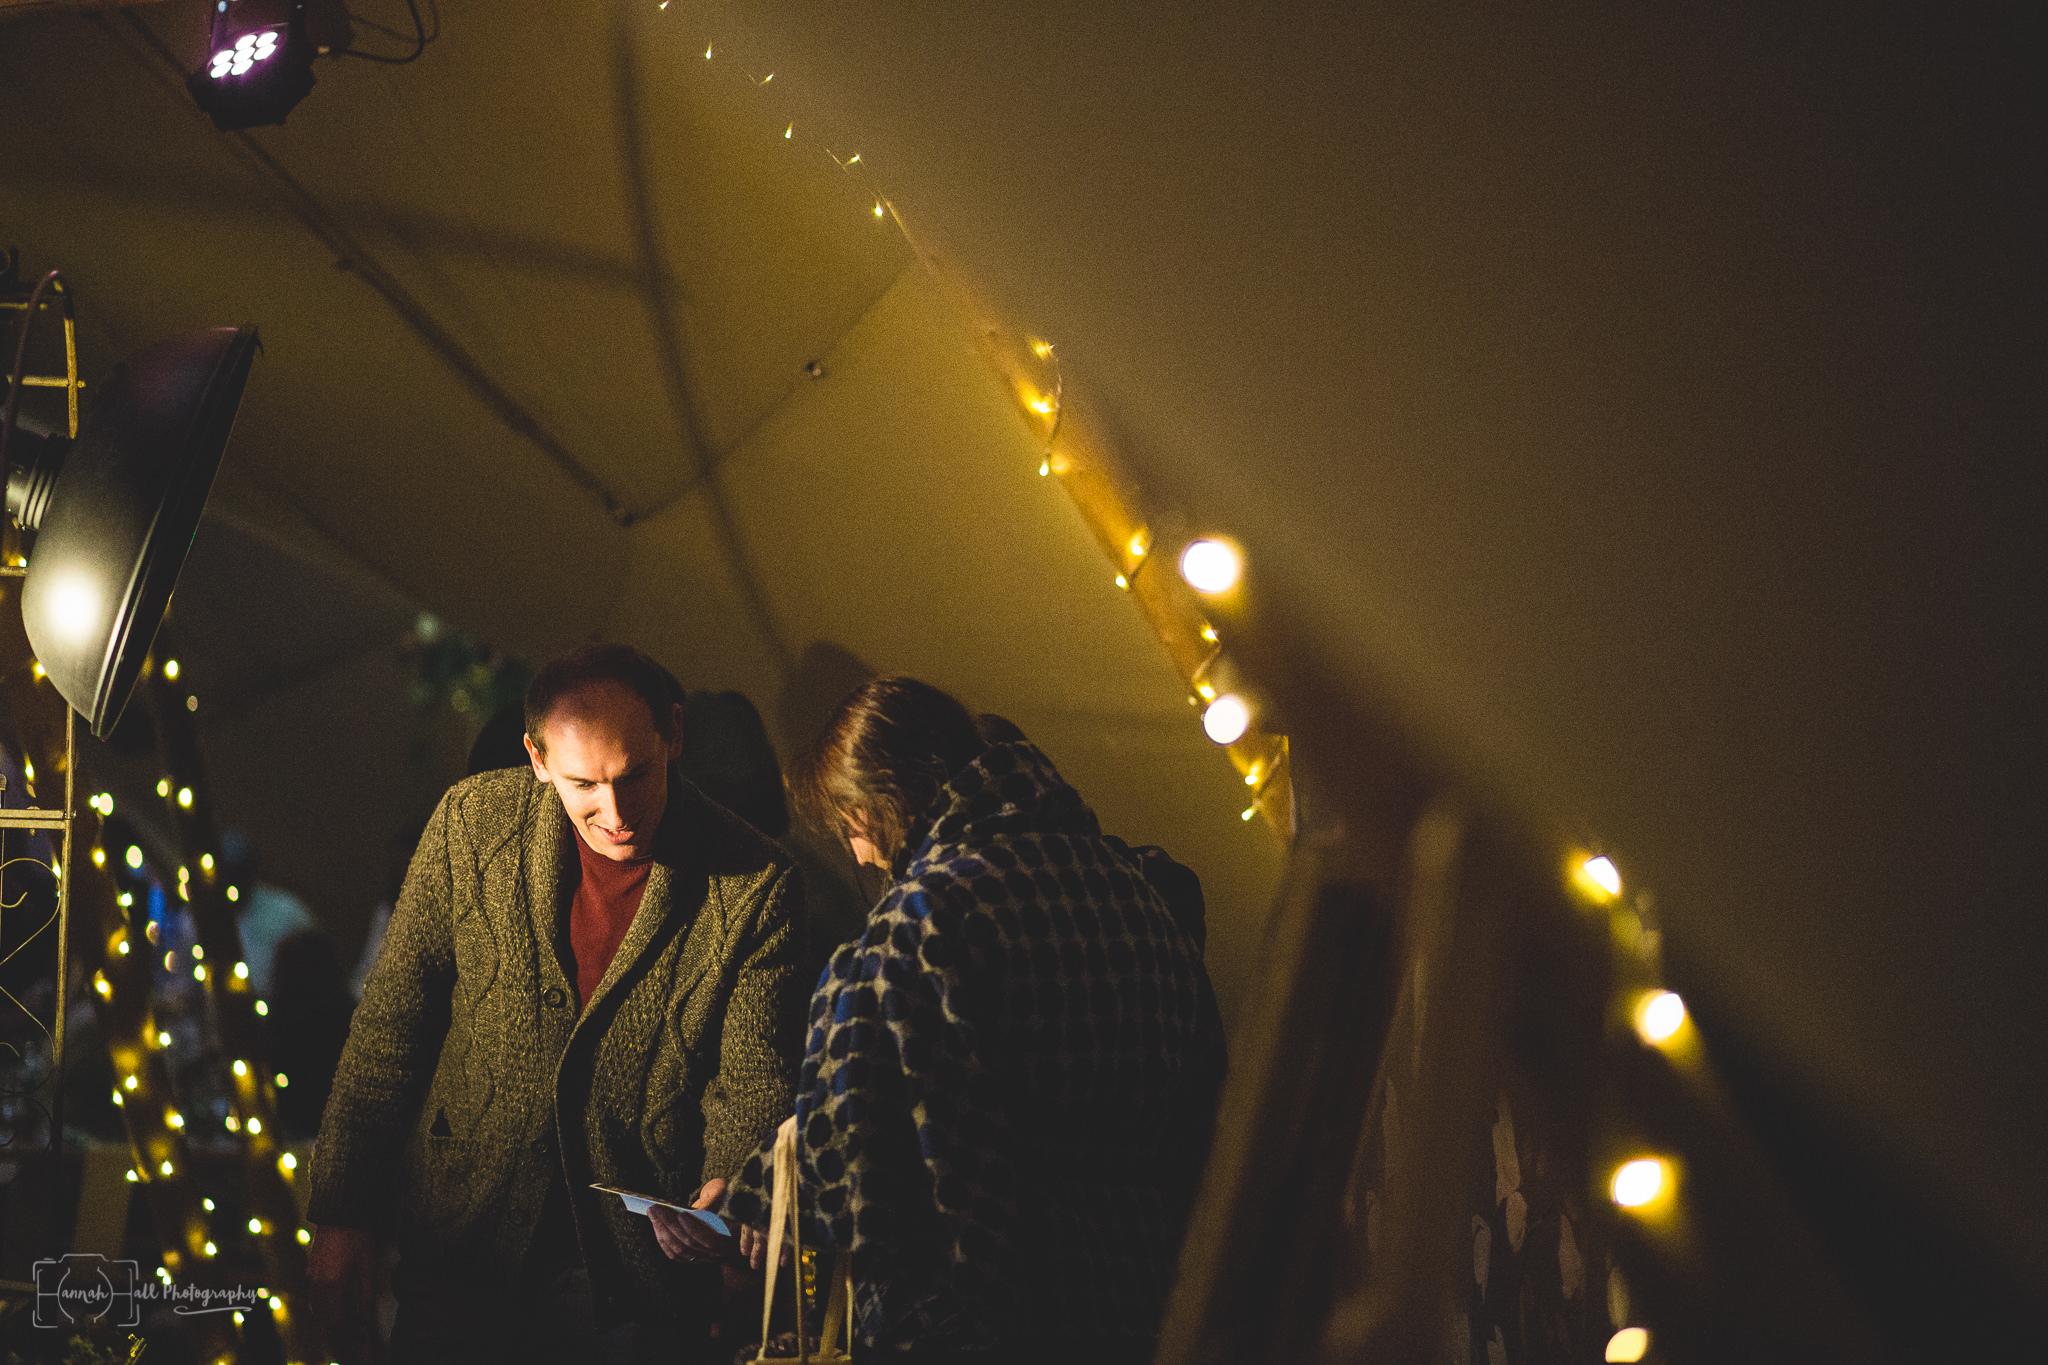 hhp_derbyshire_wedding_photographer-31